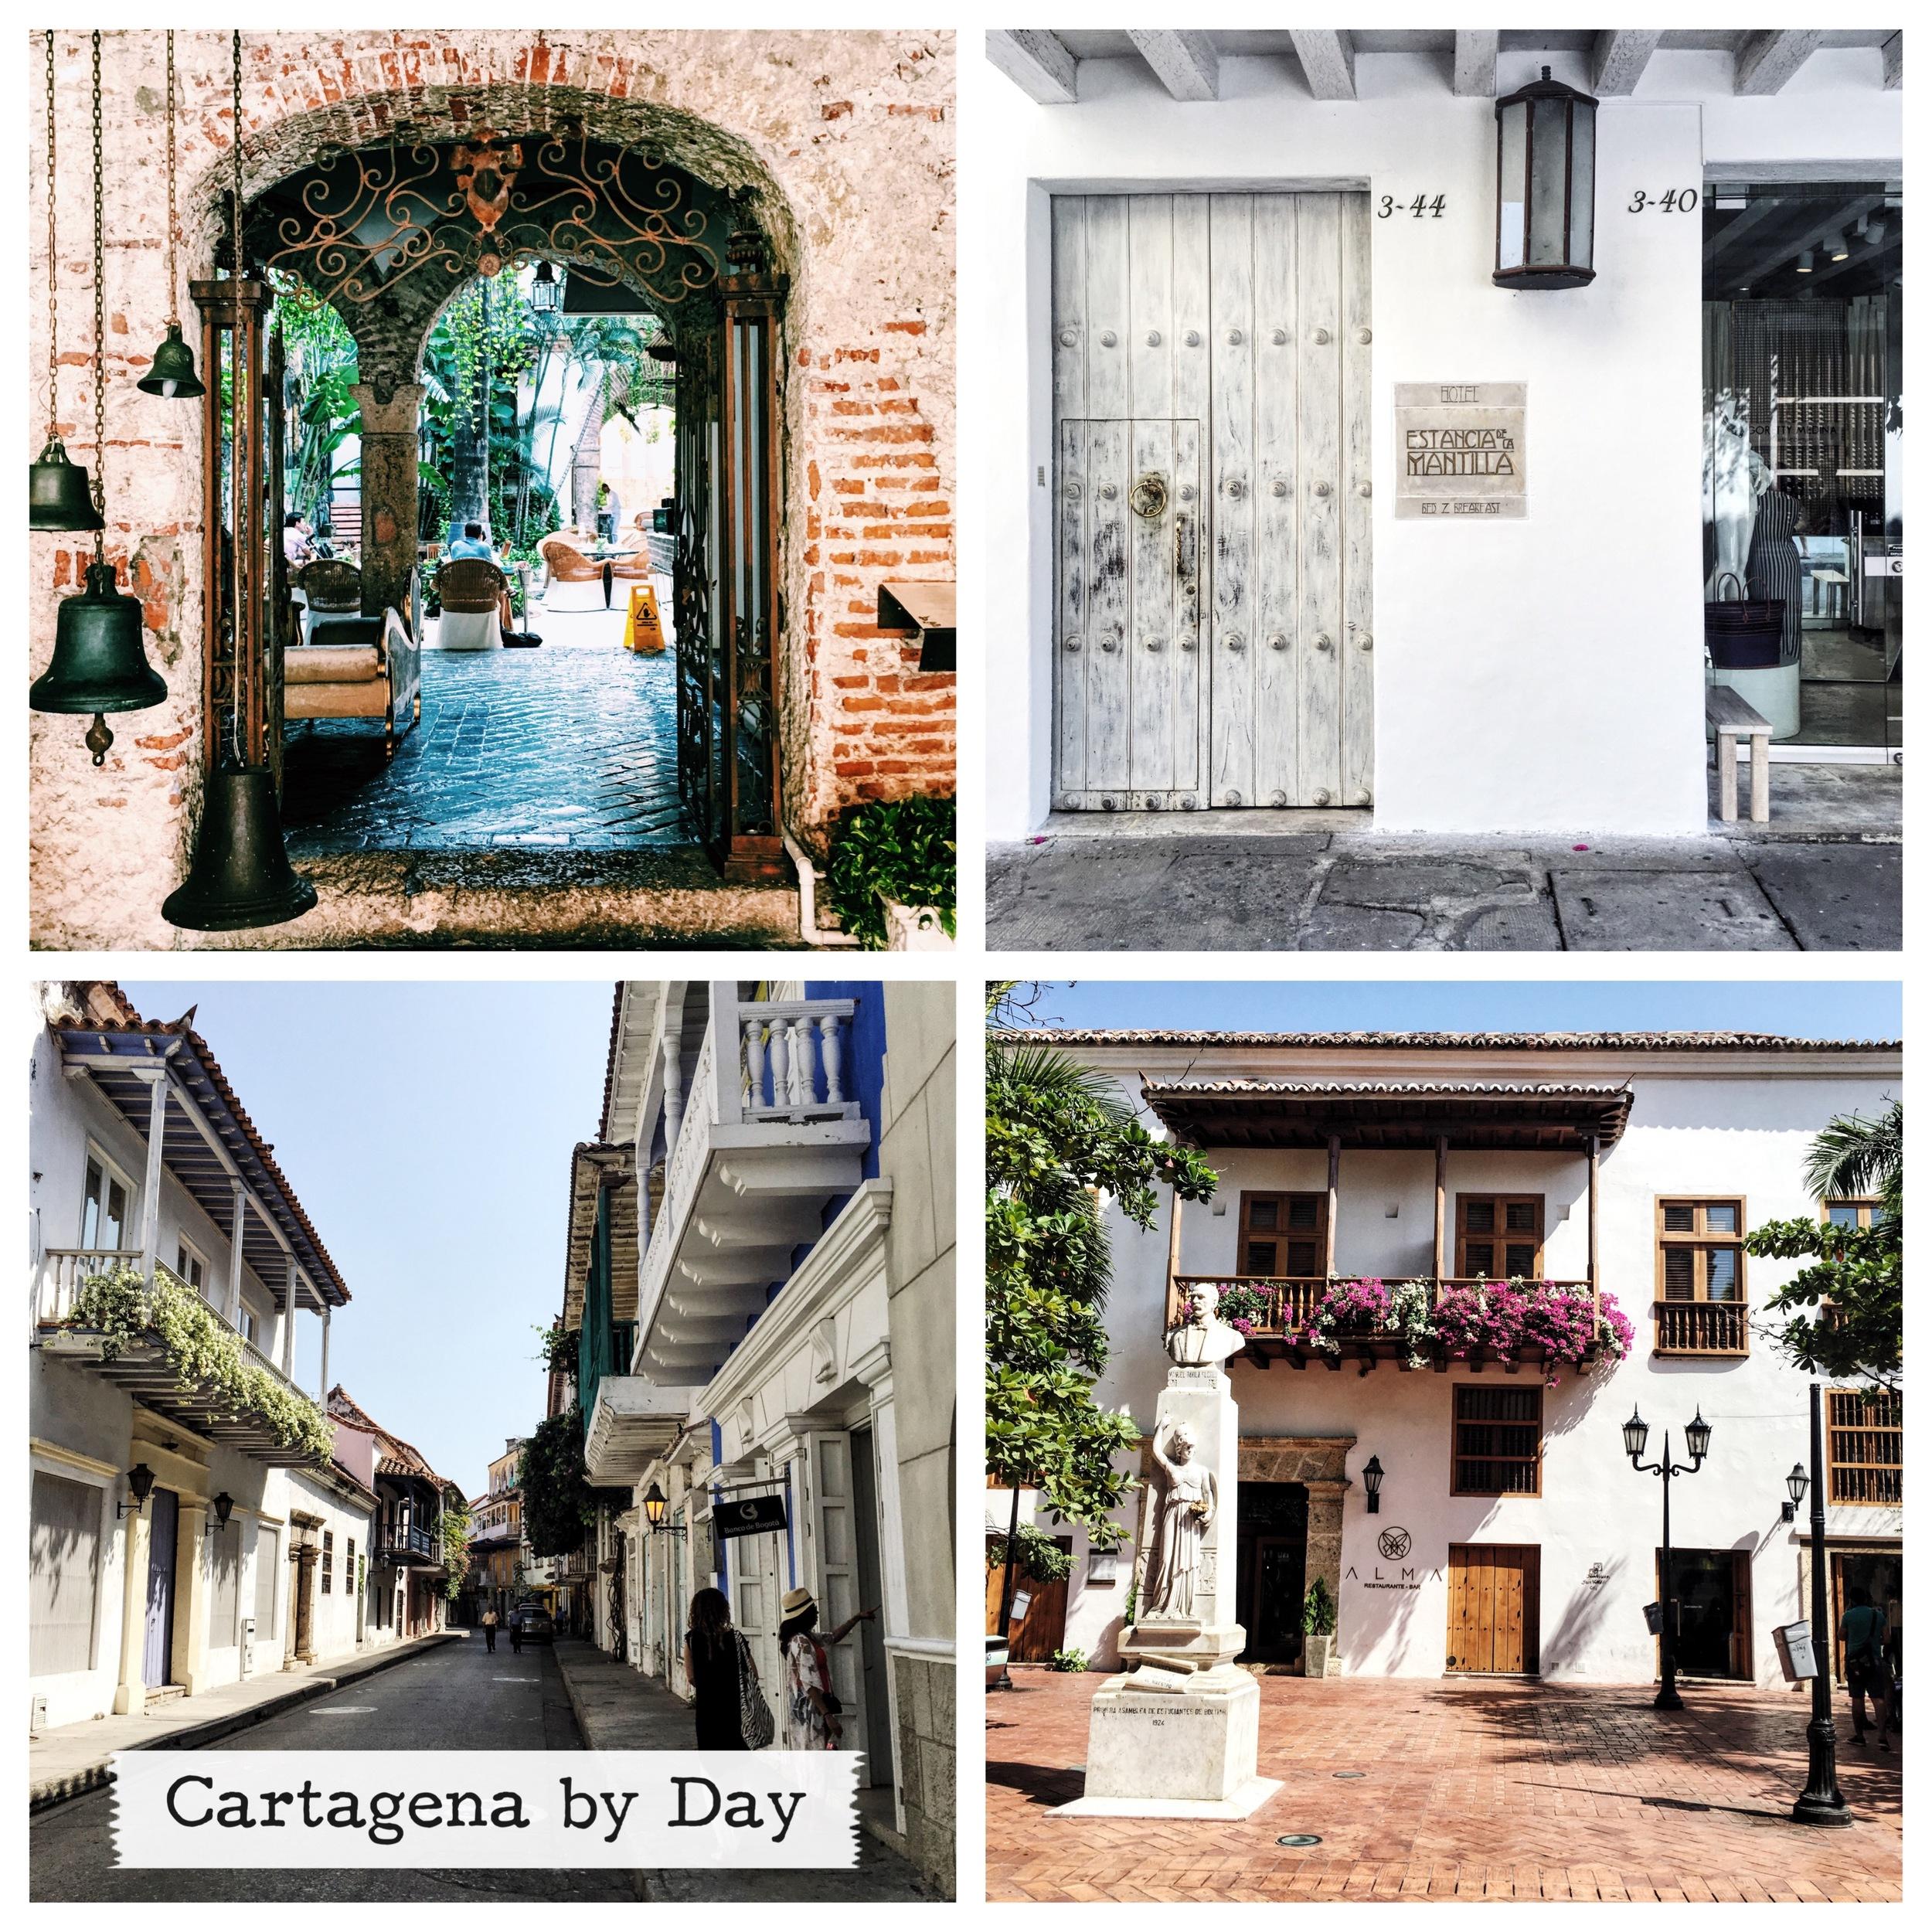 Cartagena by Day